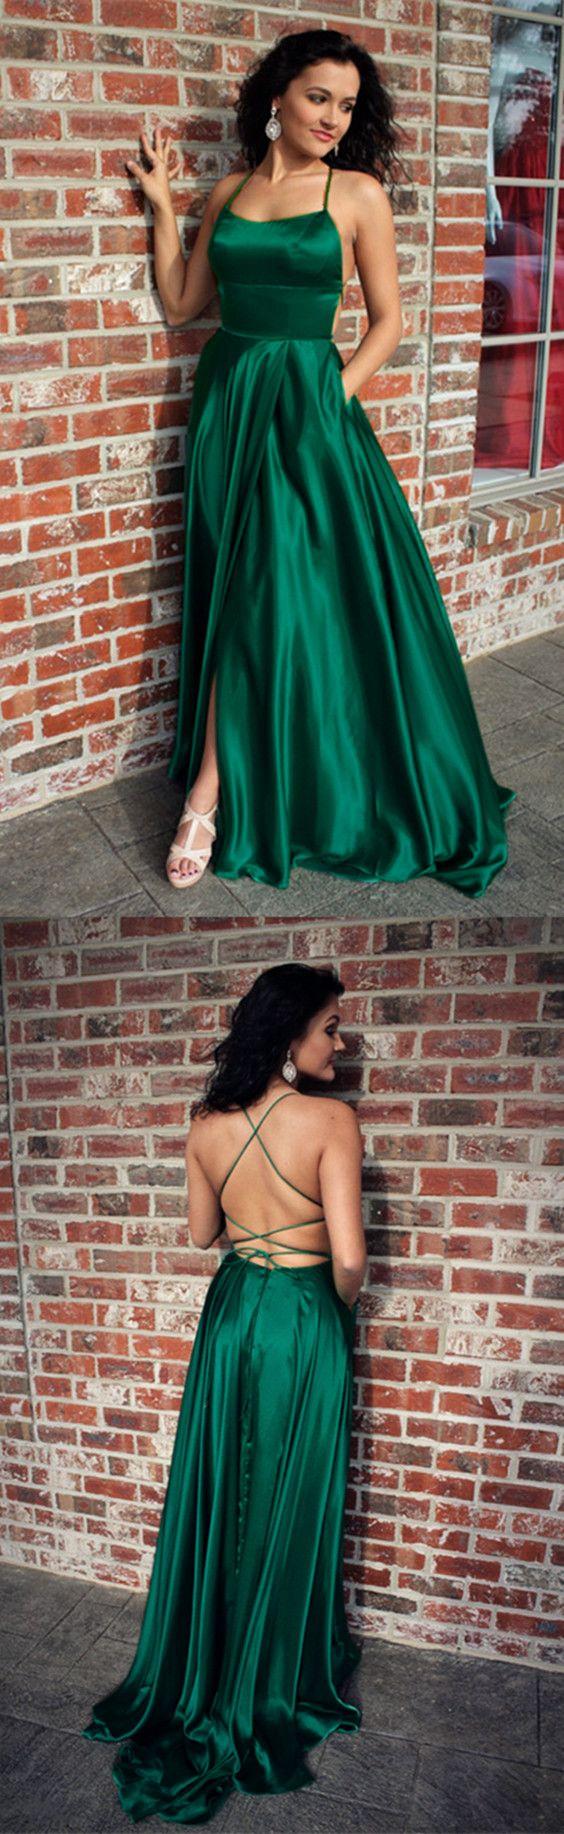 Spaghetti Straps Prom Dress, Long Prom Dress, Emerald Green Prom ...